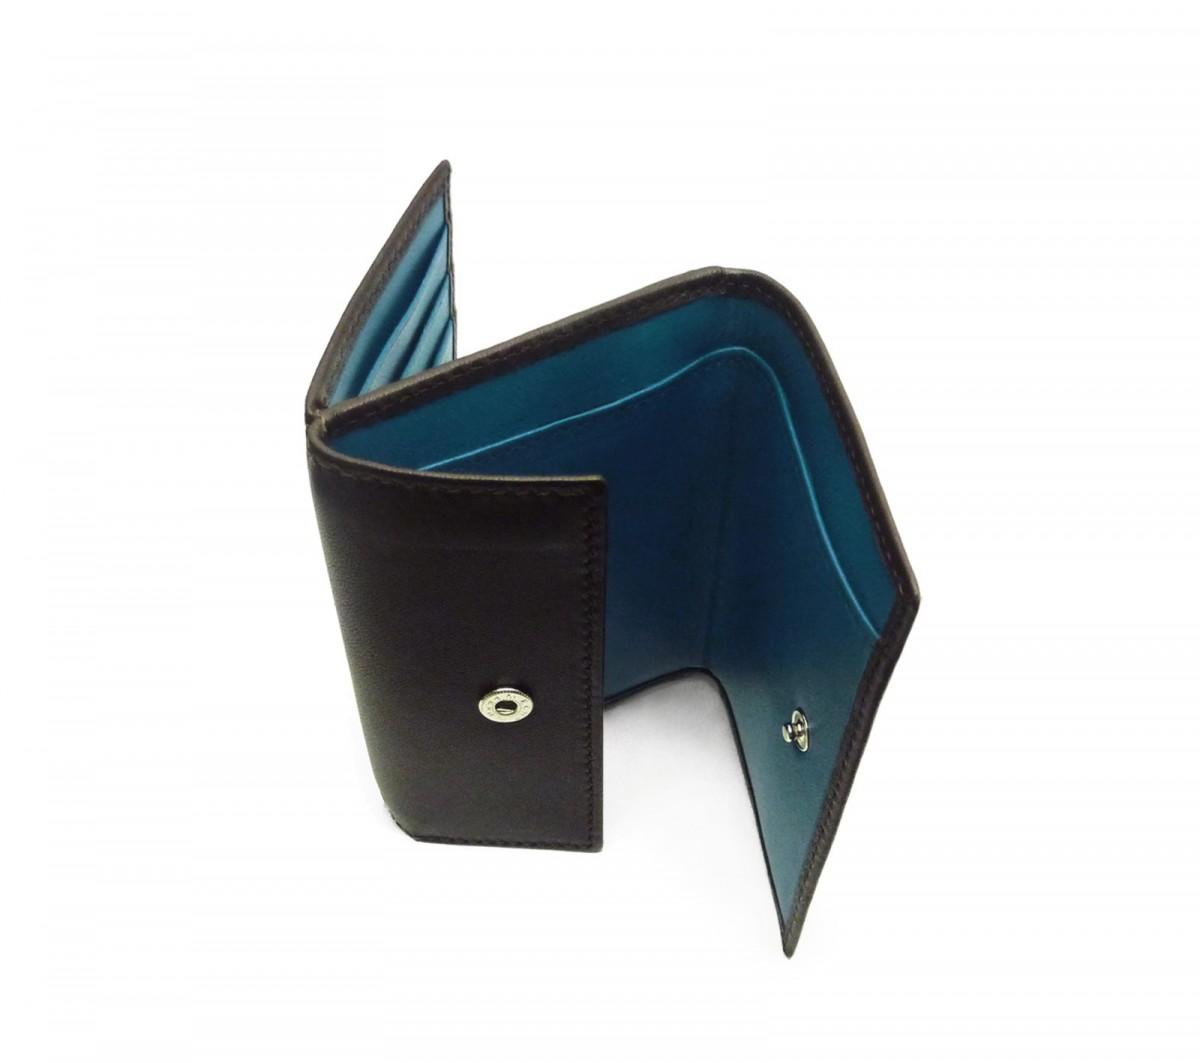 Wallet/cardholder Troika